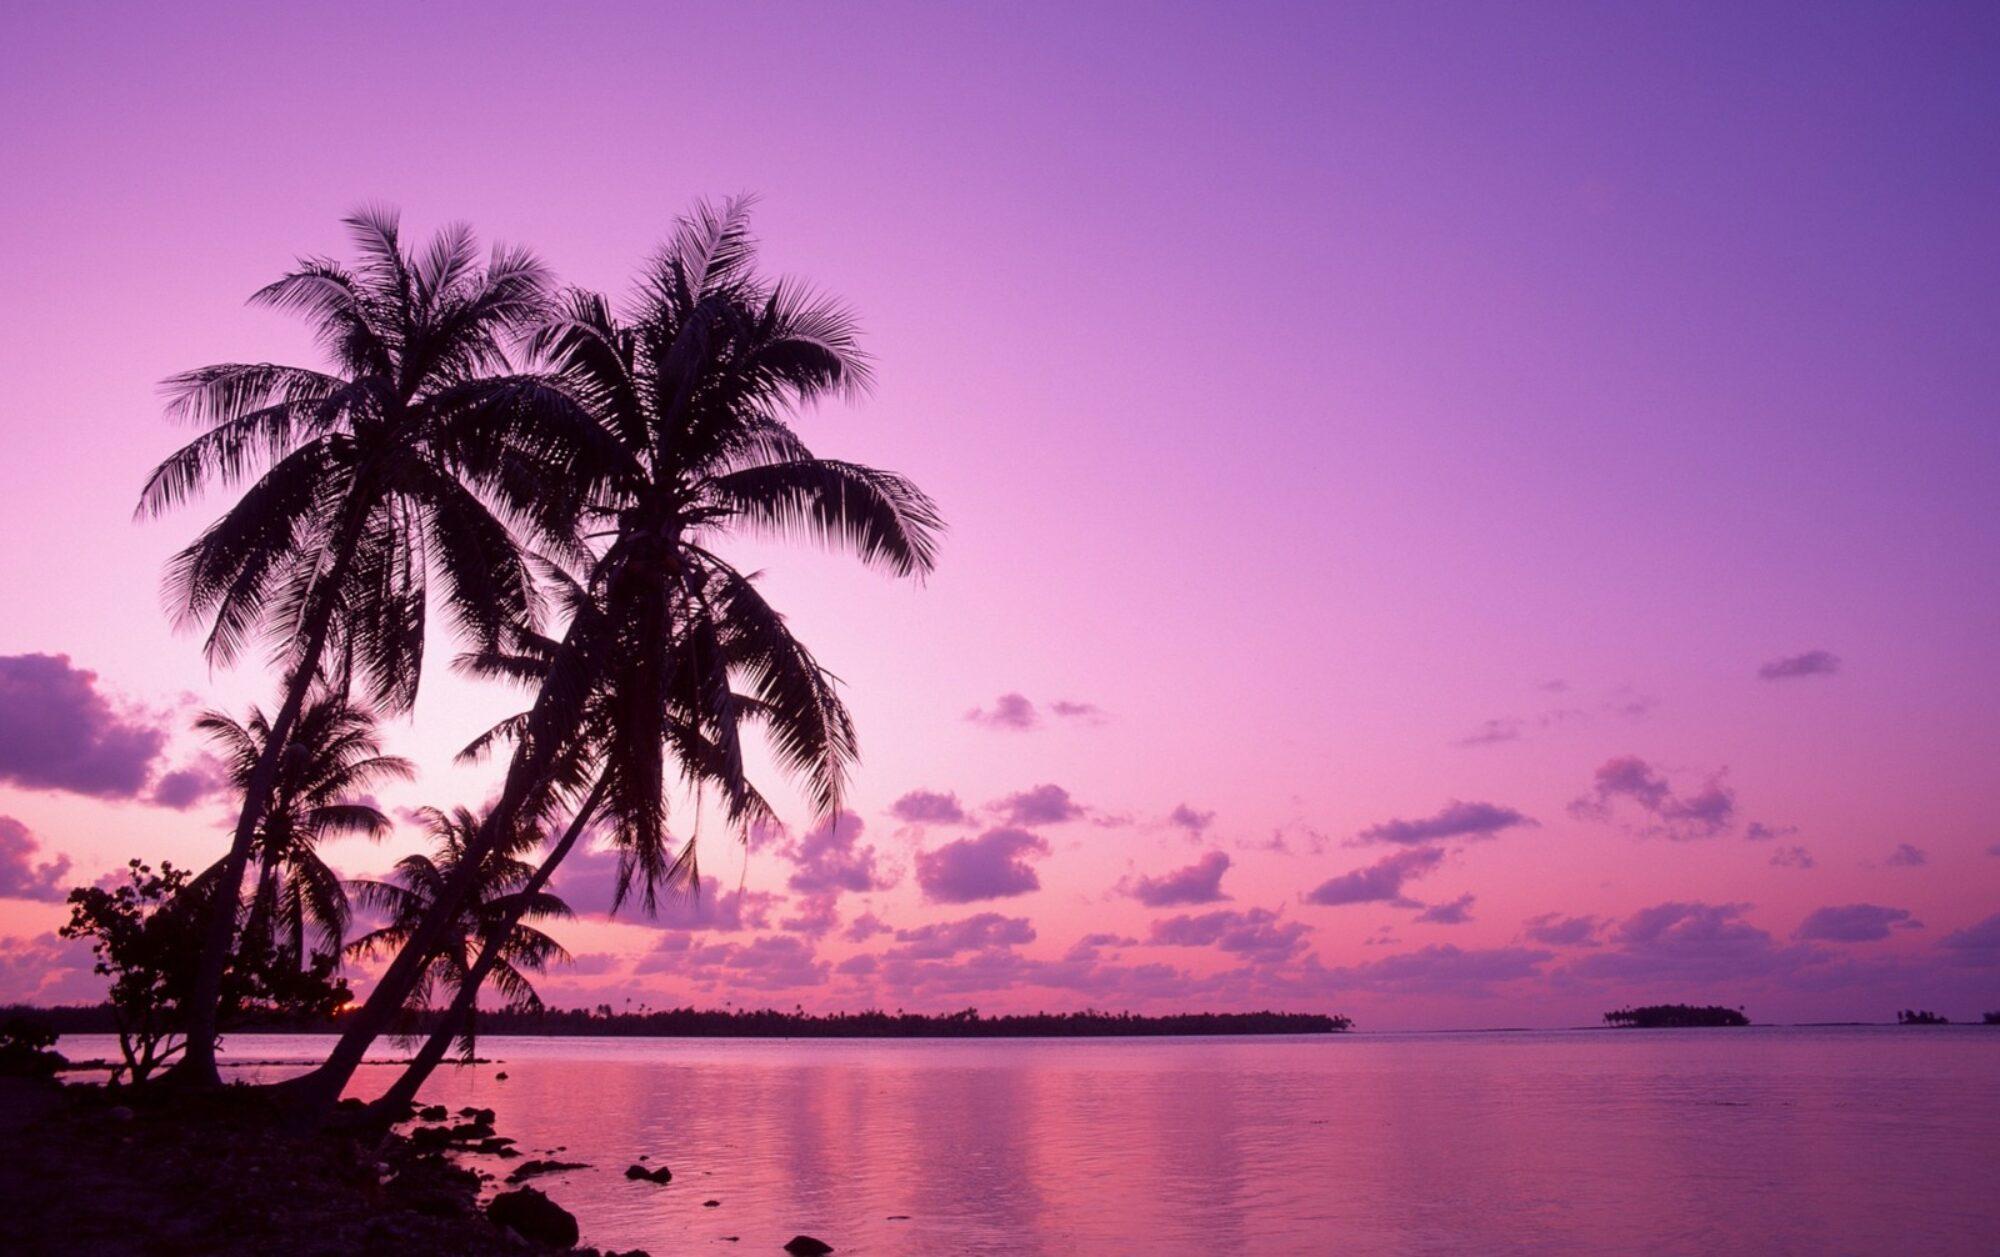 Willkommen bei Karibik Tropical